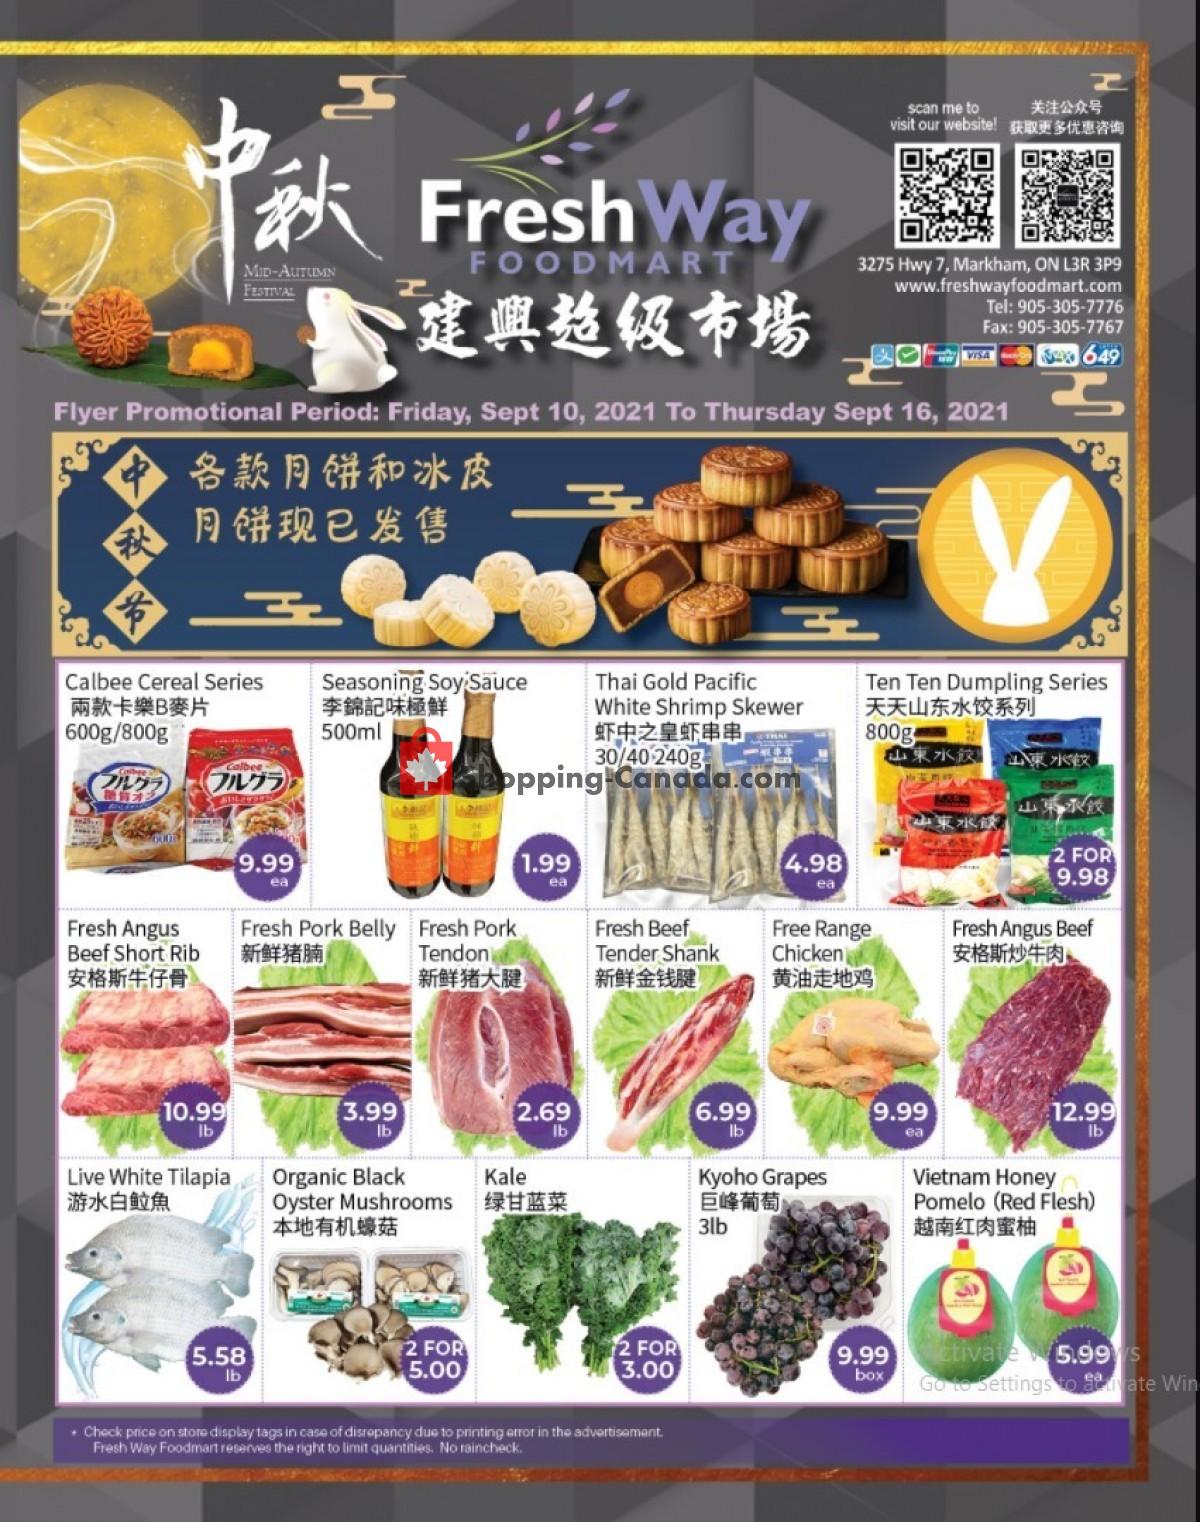 Flyer FreshWay Foodmart Canada - from Friday September 10, 2021 to Thursday September 16, 2021